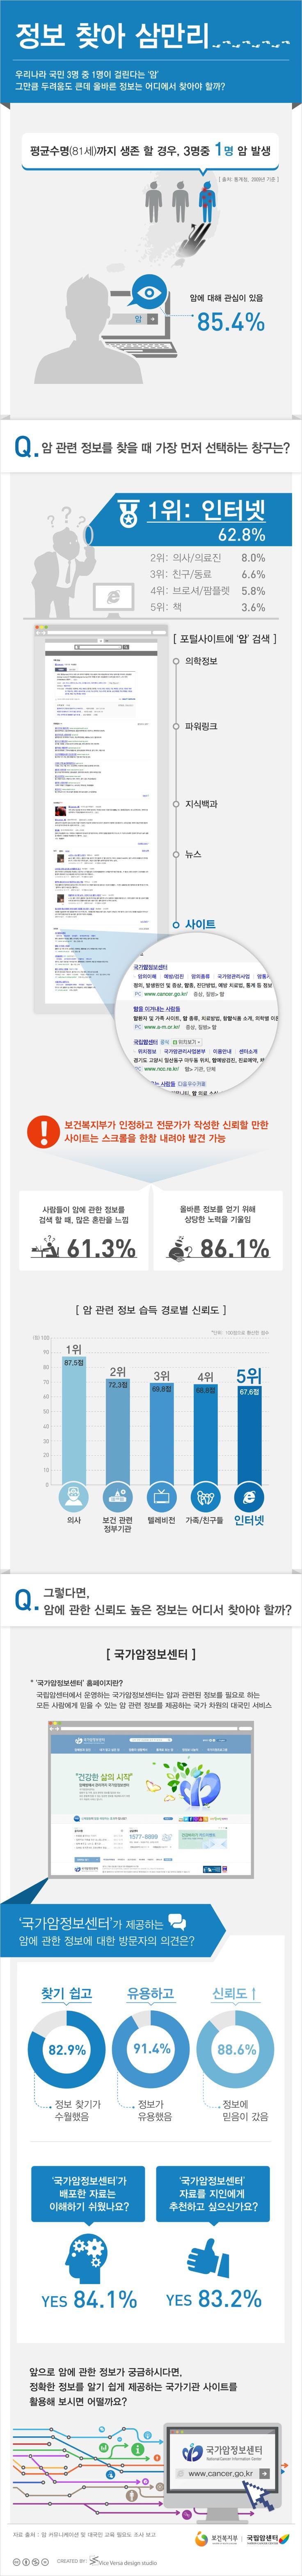 [Infographic] 암 관련 정보 습득과정에 관한 인포그래픽